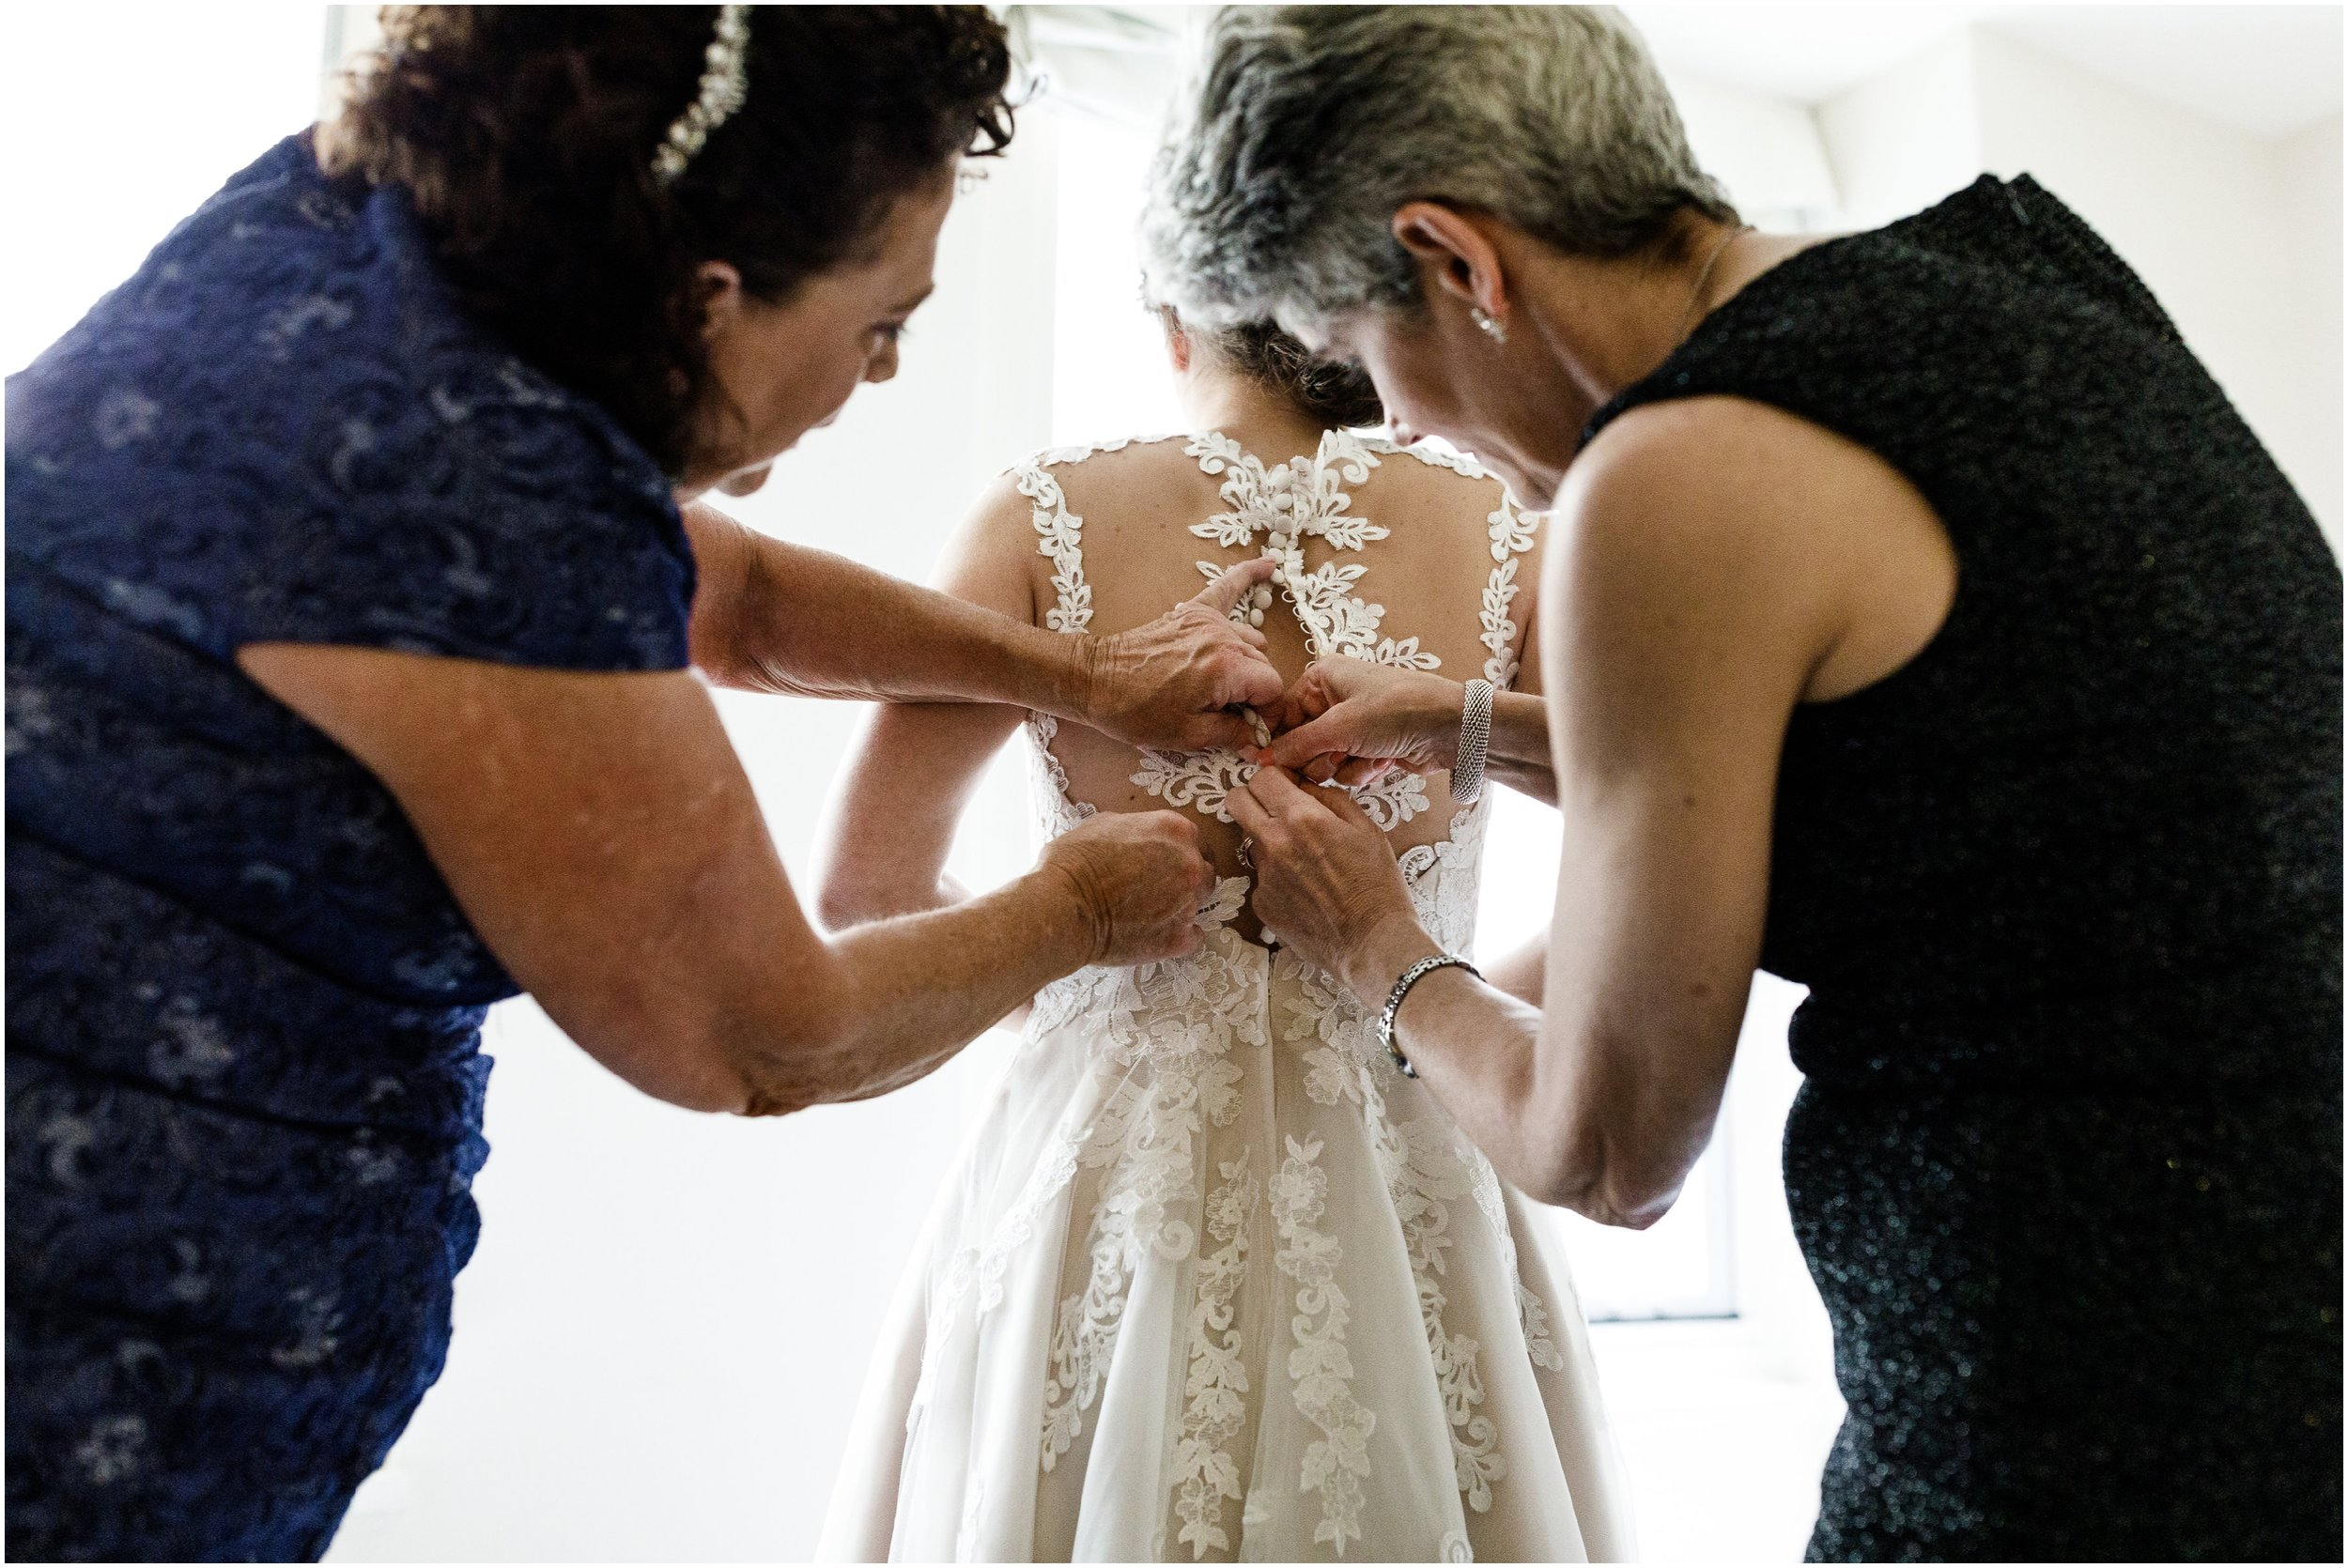 mother of bride helping bride put on her wedding dress